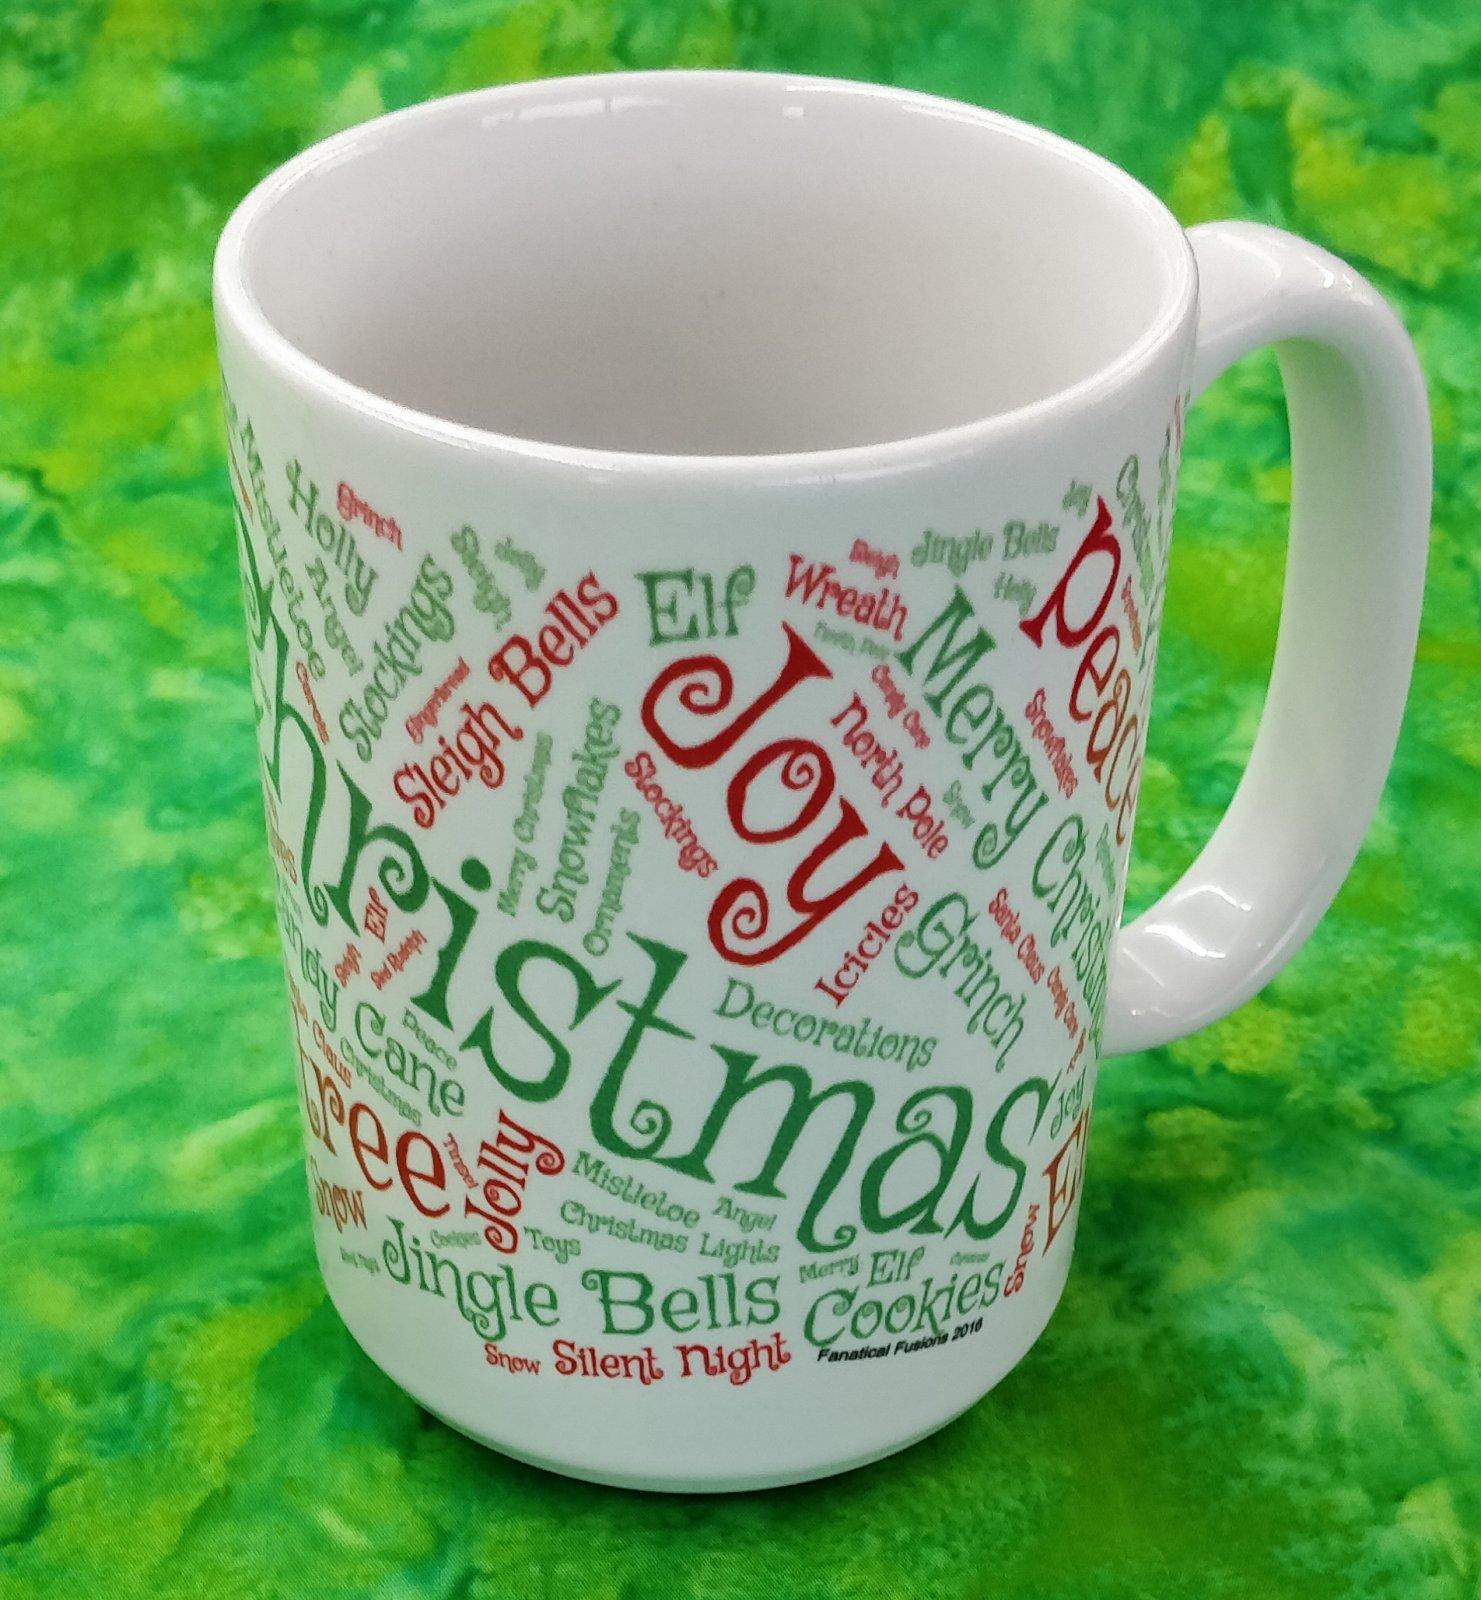 Mug - Christmas - in store or curbside